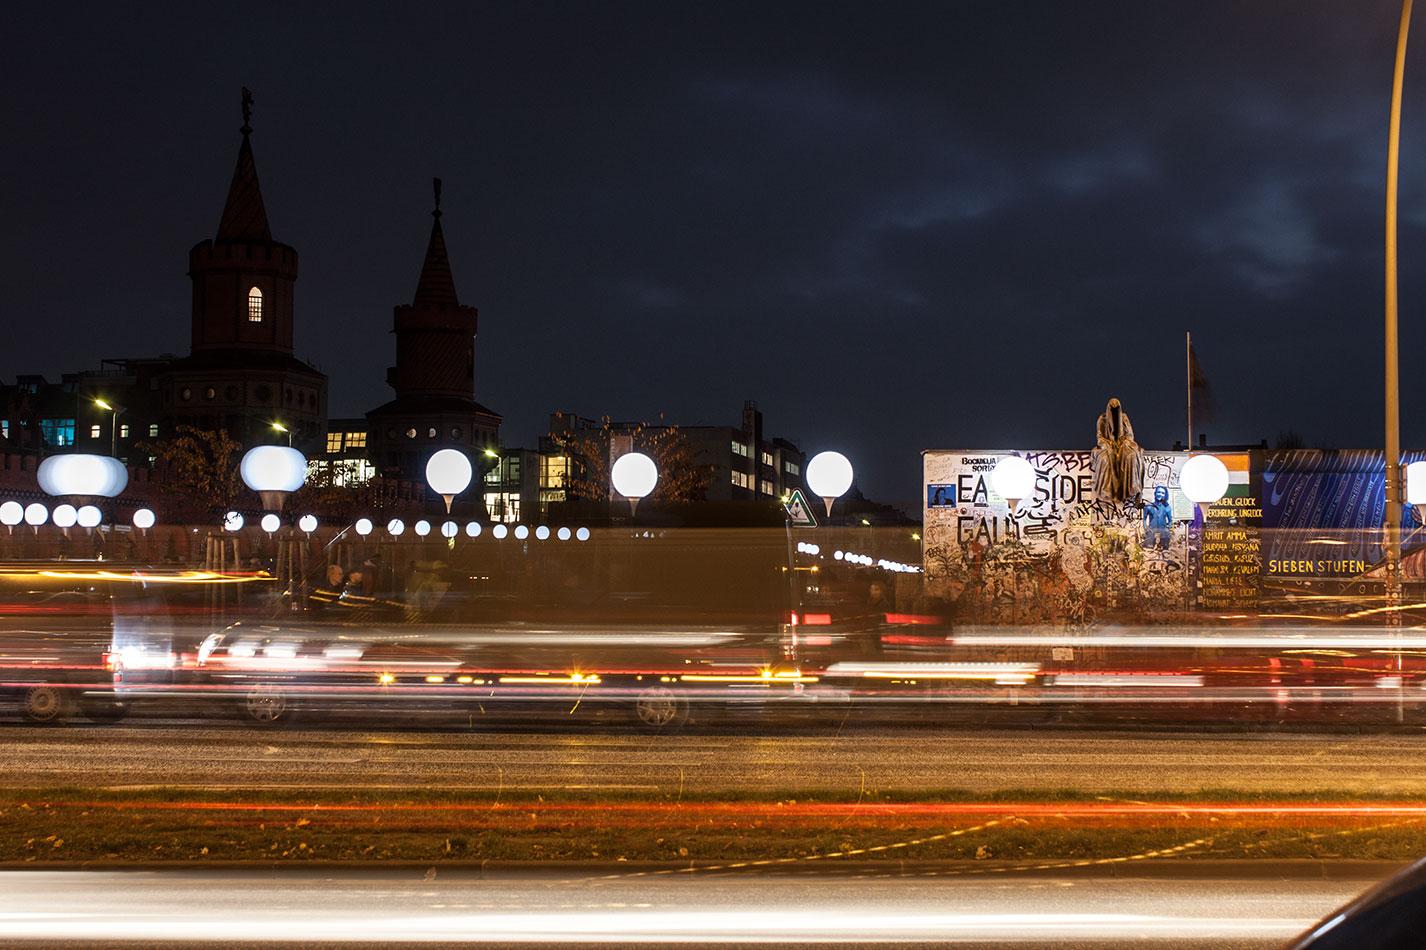 25-jears-wallfall-berlin-germany-contemporary-fine-art-show-arts-design-guardians-of-time-manfred-kili-kielnhofer-4271